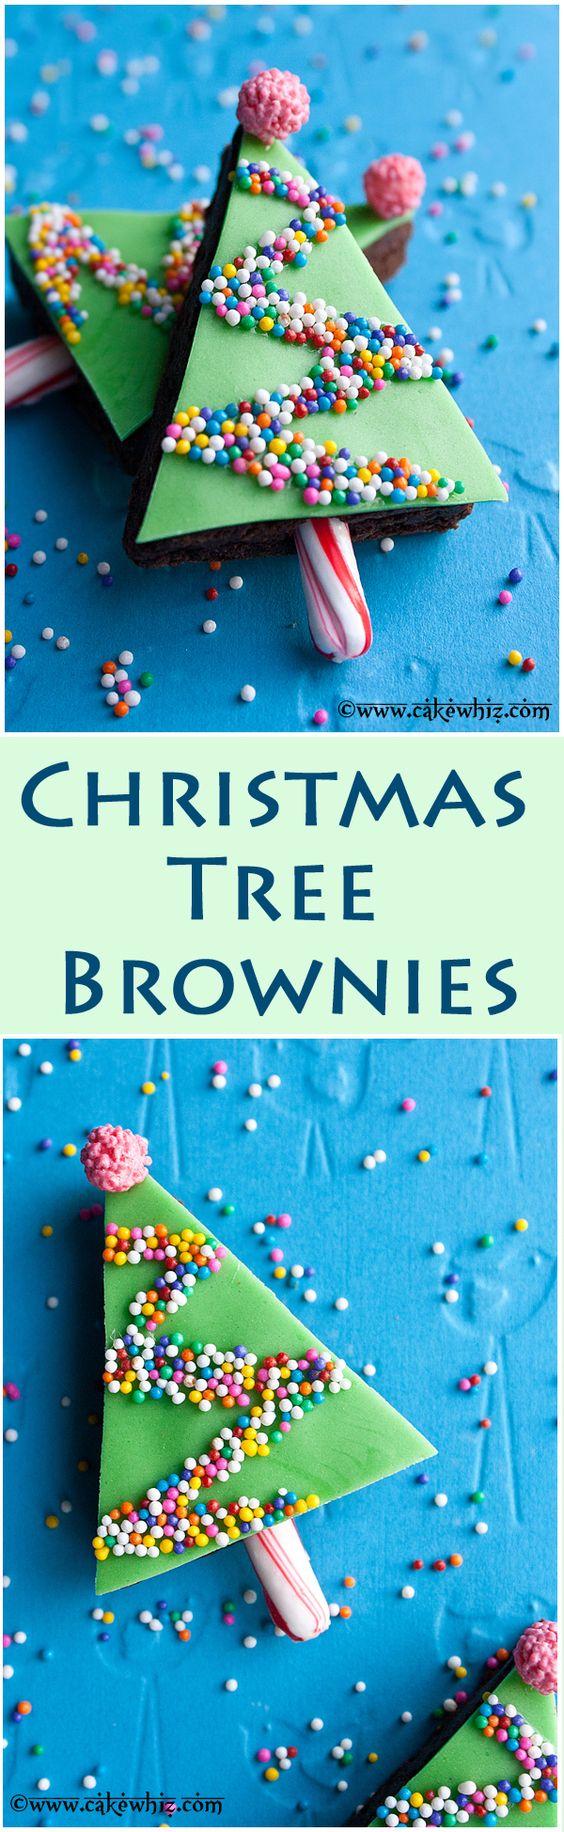 Christmas Tree Brownies, cute and sprinkly treats for the holiday season, holiday treats, holidays, desserts, party food, Christmas party treats, sprinkles, trees